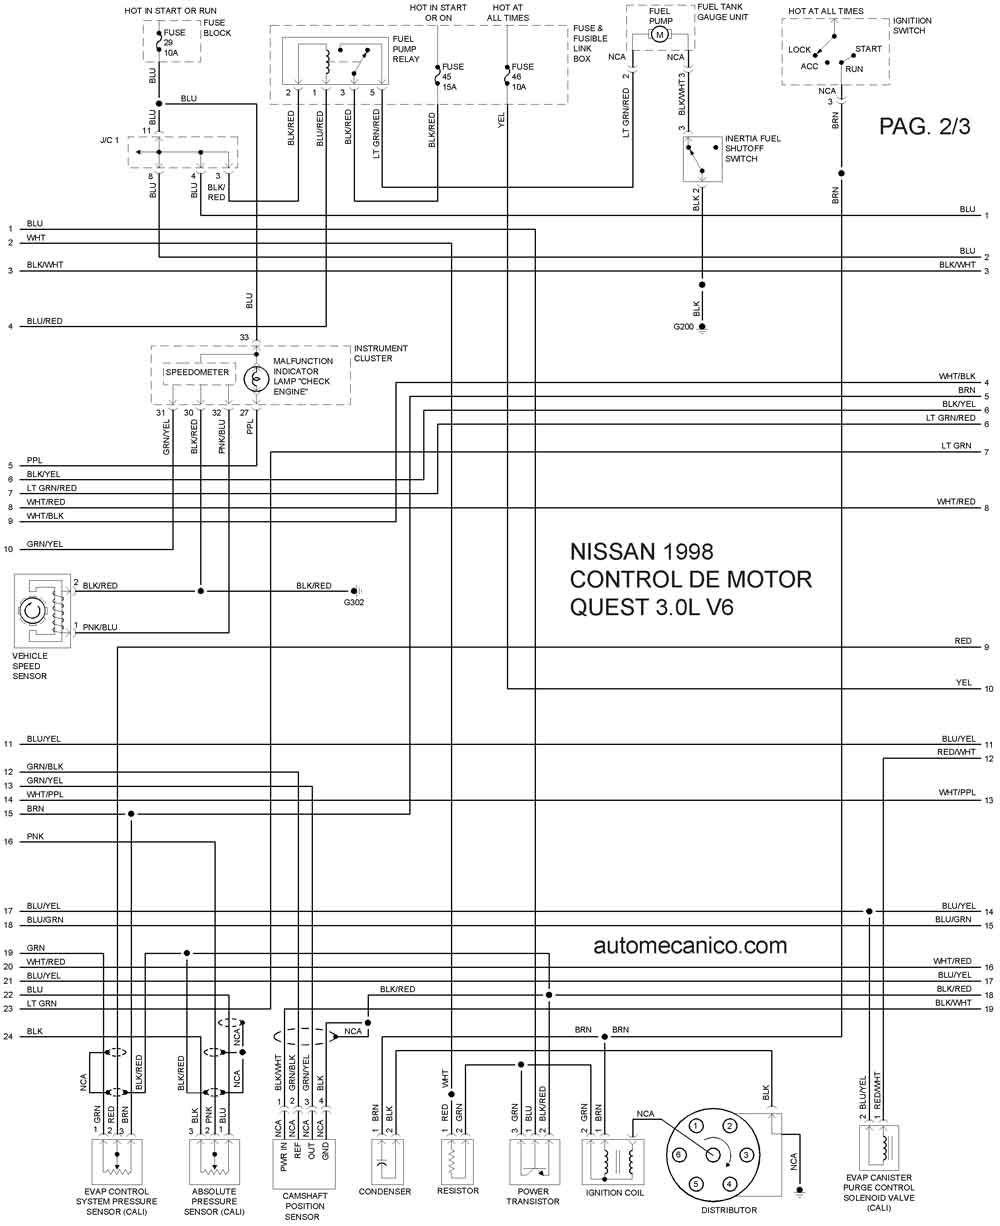 Diagrama Electrico Nissan Tsuru Ii 4 Chrysler Pacifica Nissan Nissan Sentra